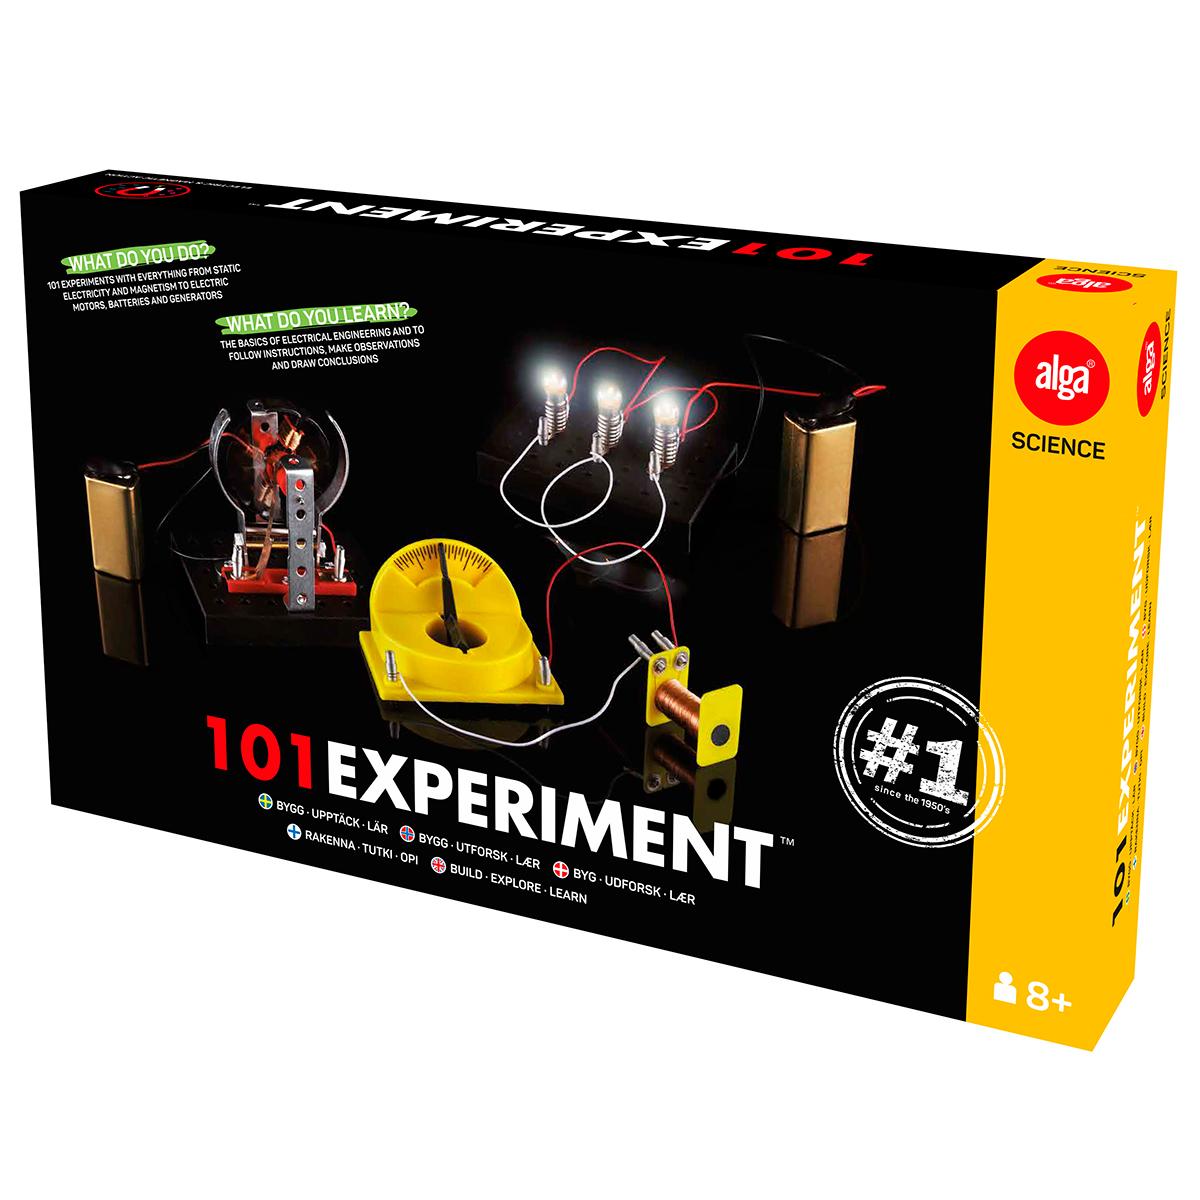 Eksperimenter & fysikleg